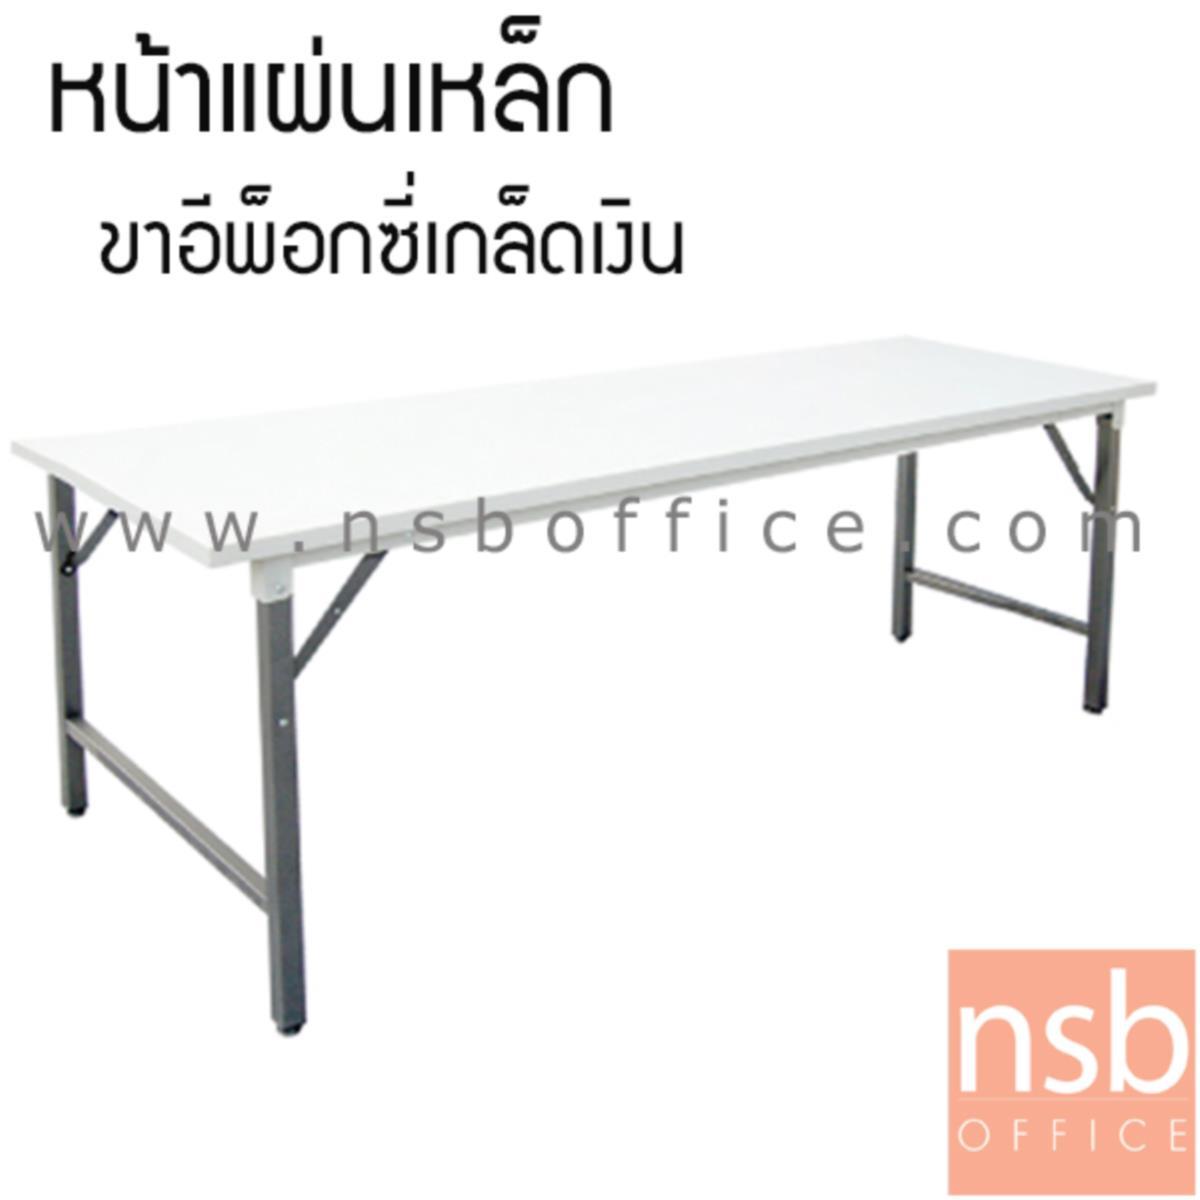 A19A019:โต๊ะพับหน้าเหล็ก 0.7 มม. รุ่น Ignite (อิกไนท์)  ขาอีพ็อกซี่เกล็ดเงิน